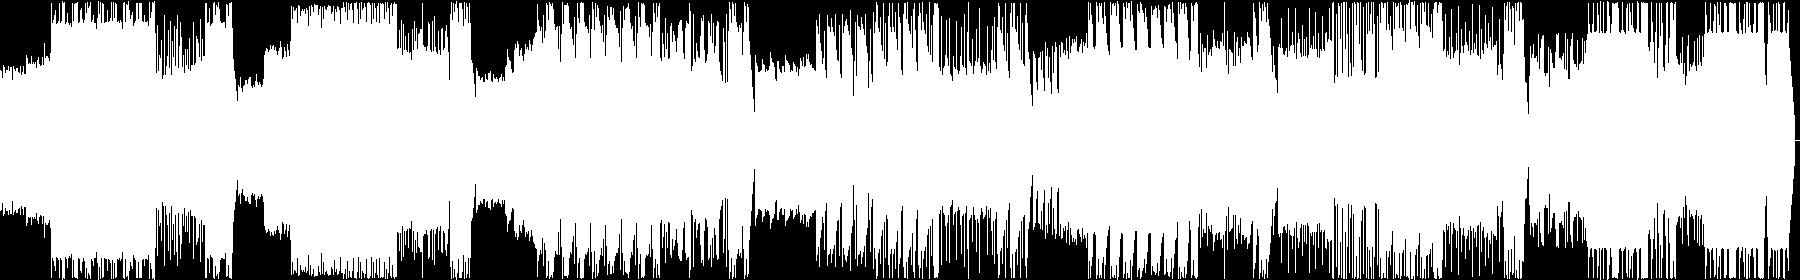 PUMP XI audio waveform